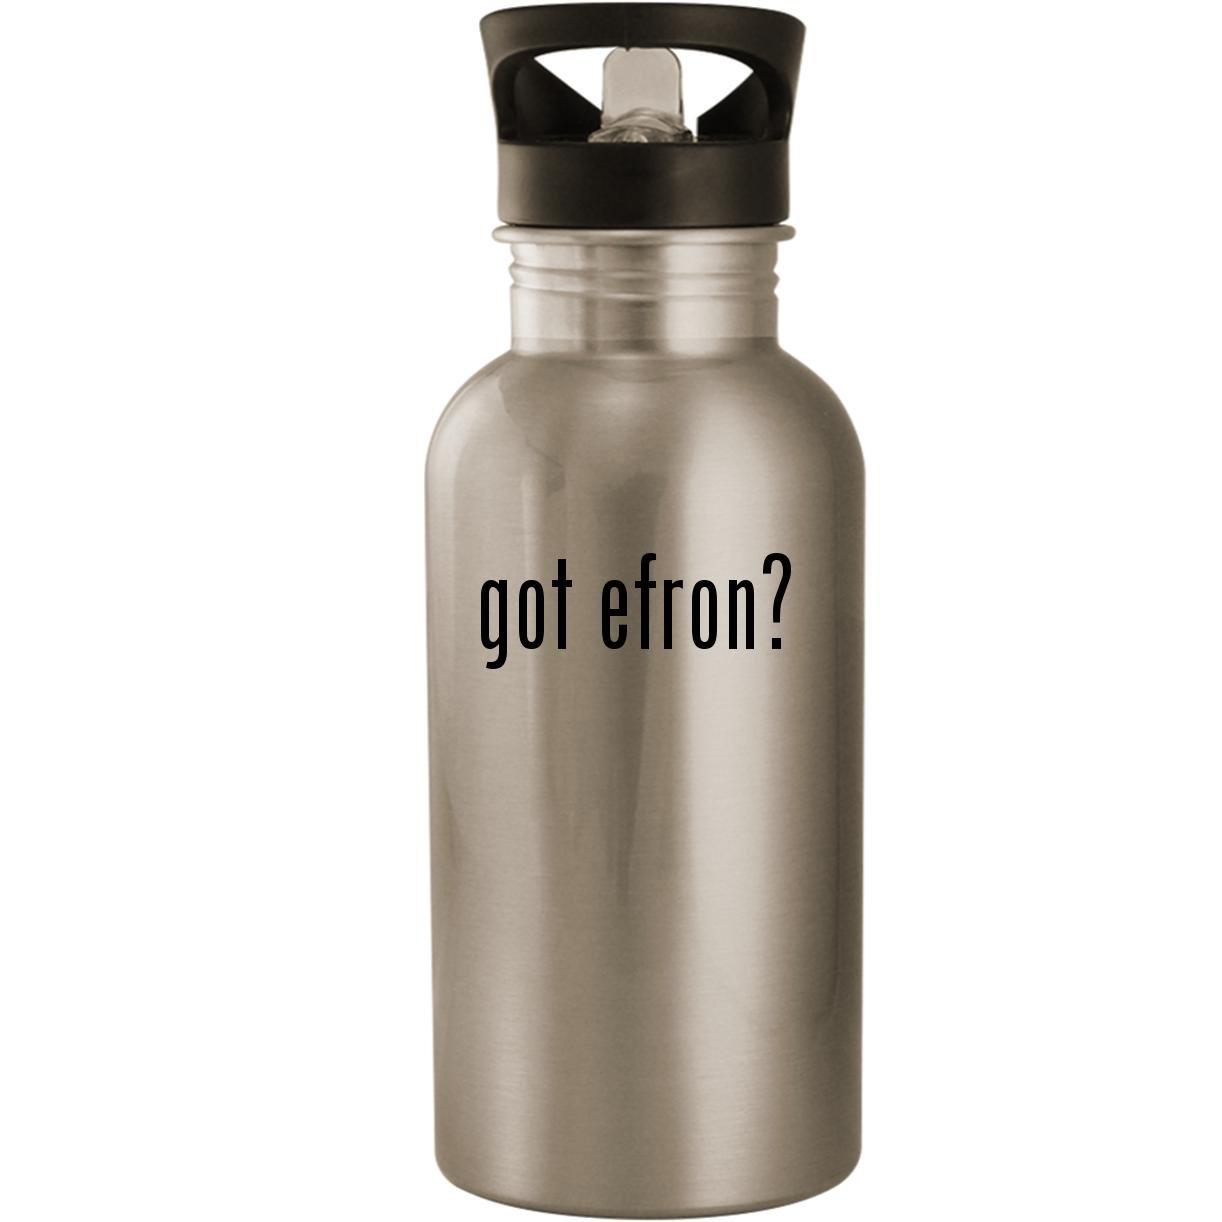 Got Efron  – ステンレススチール20oz Road Ready水ボトル シルバー US-C-07-18-01-070870-04-26-18-26 B07FMCFFX1 シルバー